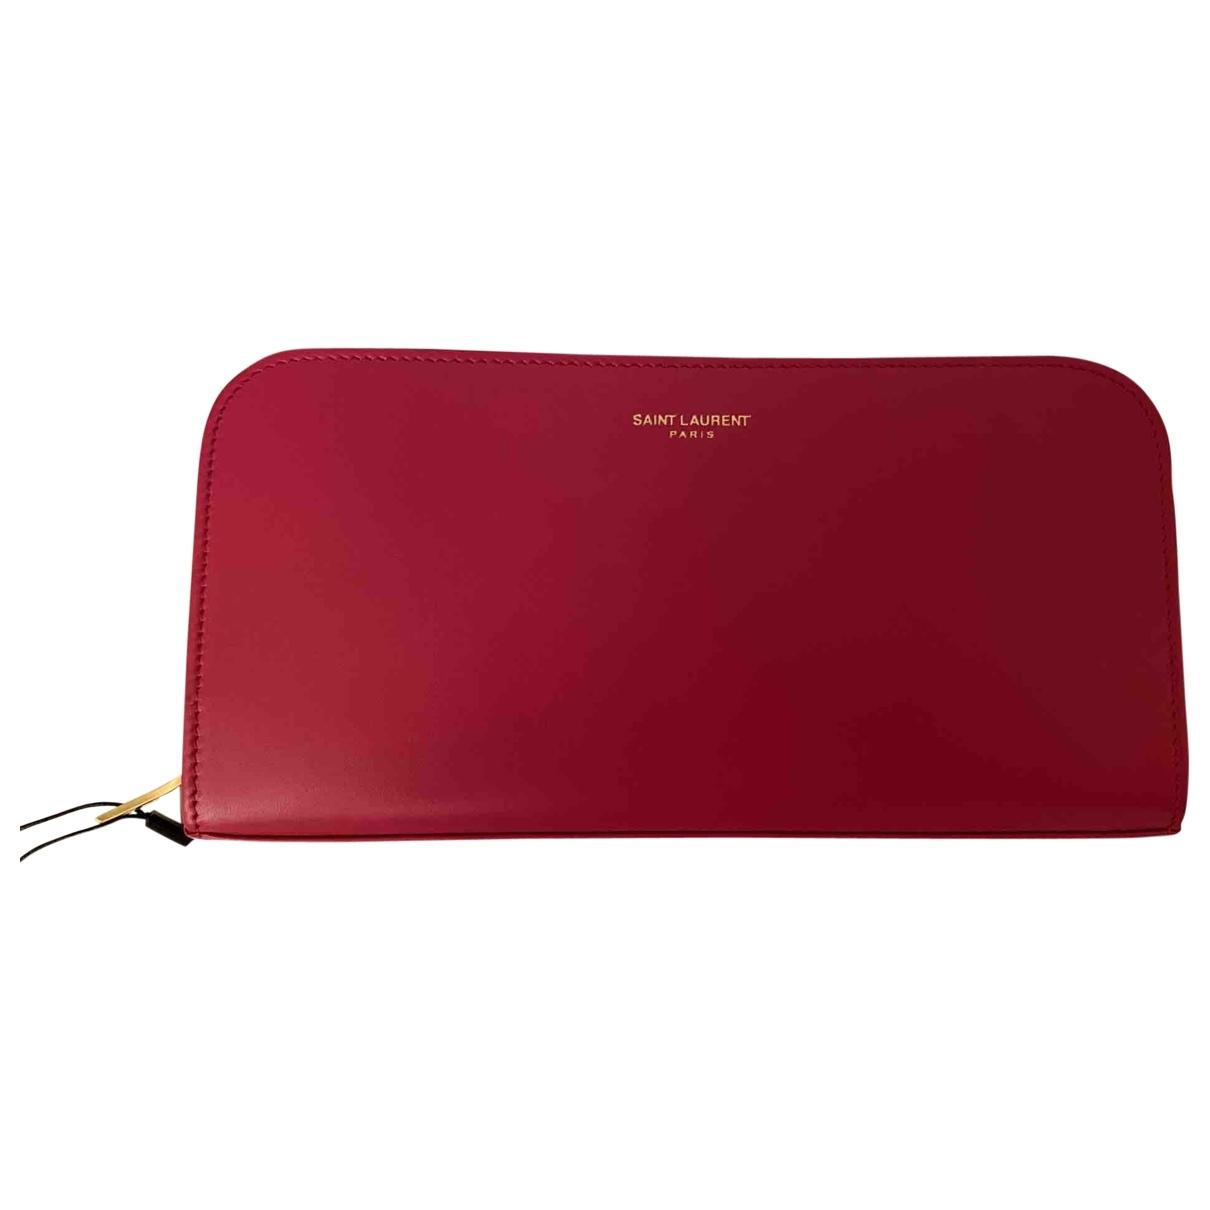 Saint Laurent Rive Gauche Pink Leather wallet for Women \N